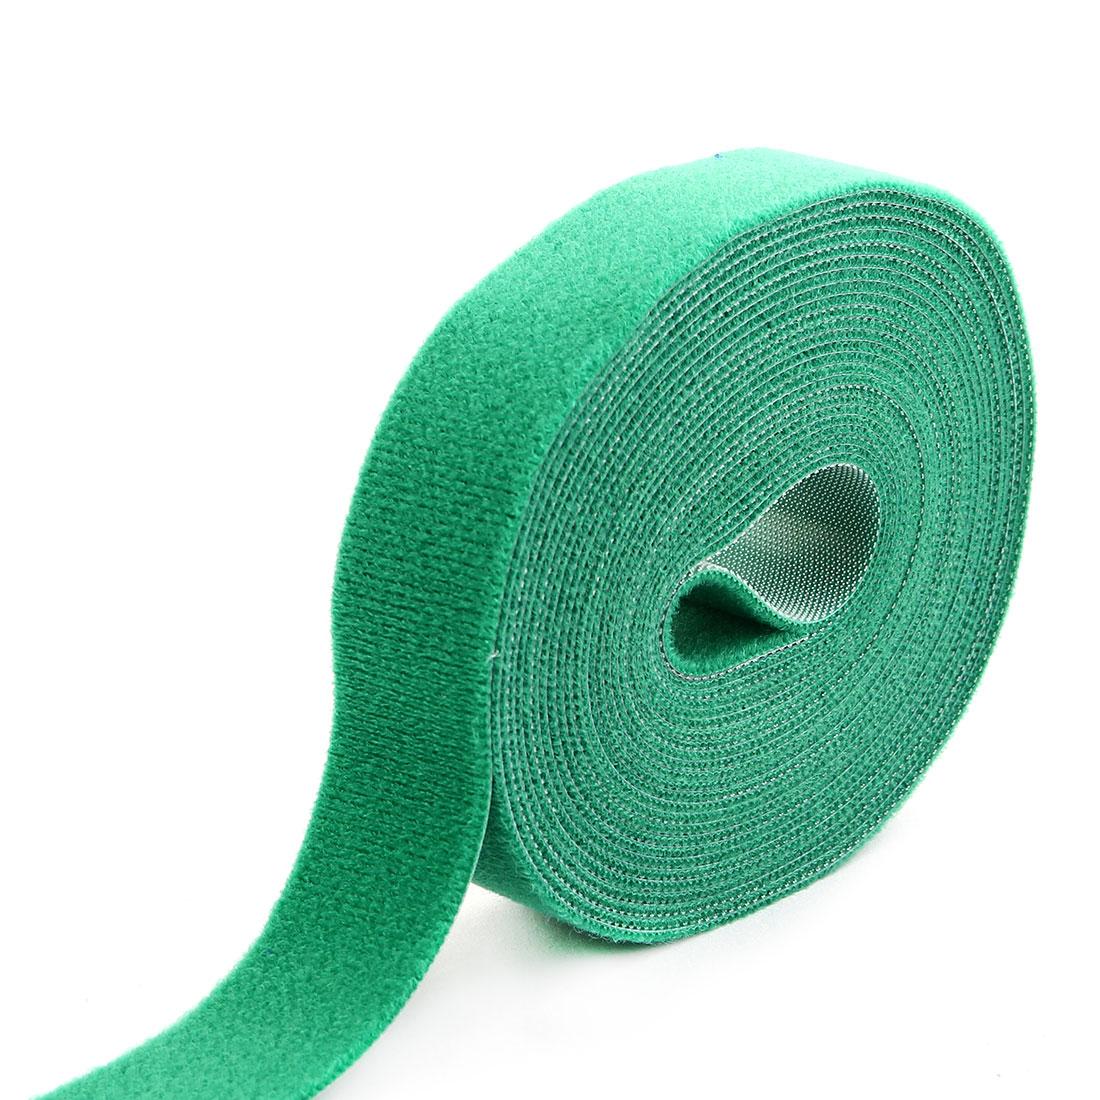 Outdoor Office Microfiber Sticky Tape Self Adhesive Hook and Loop Fastener